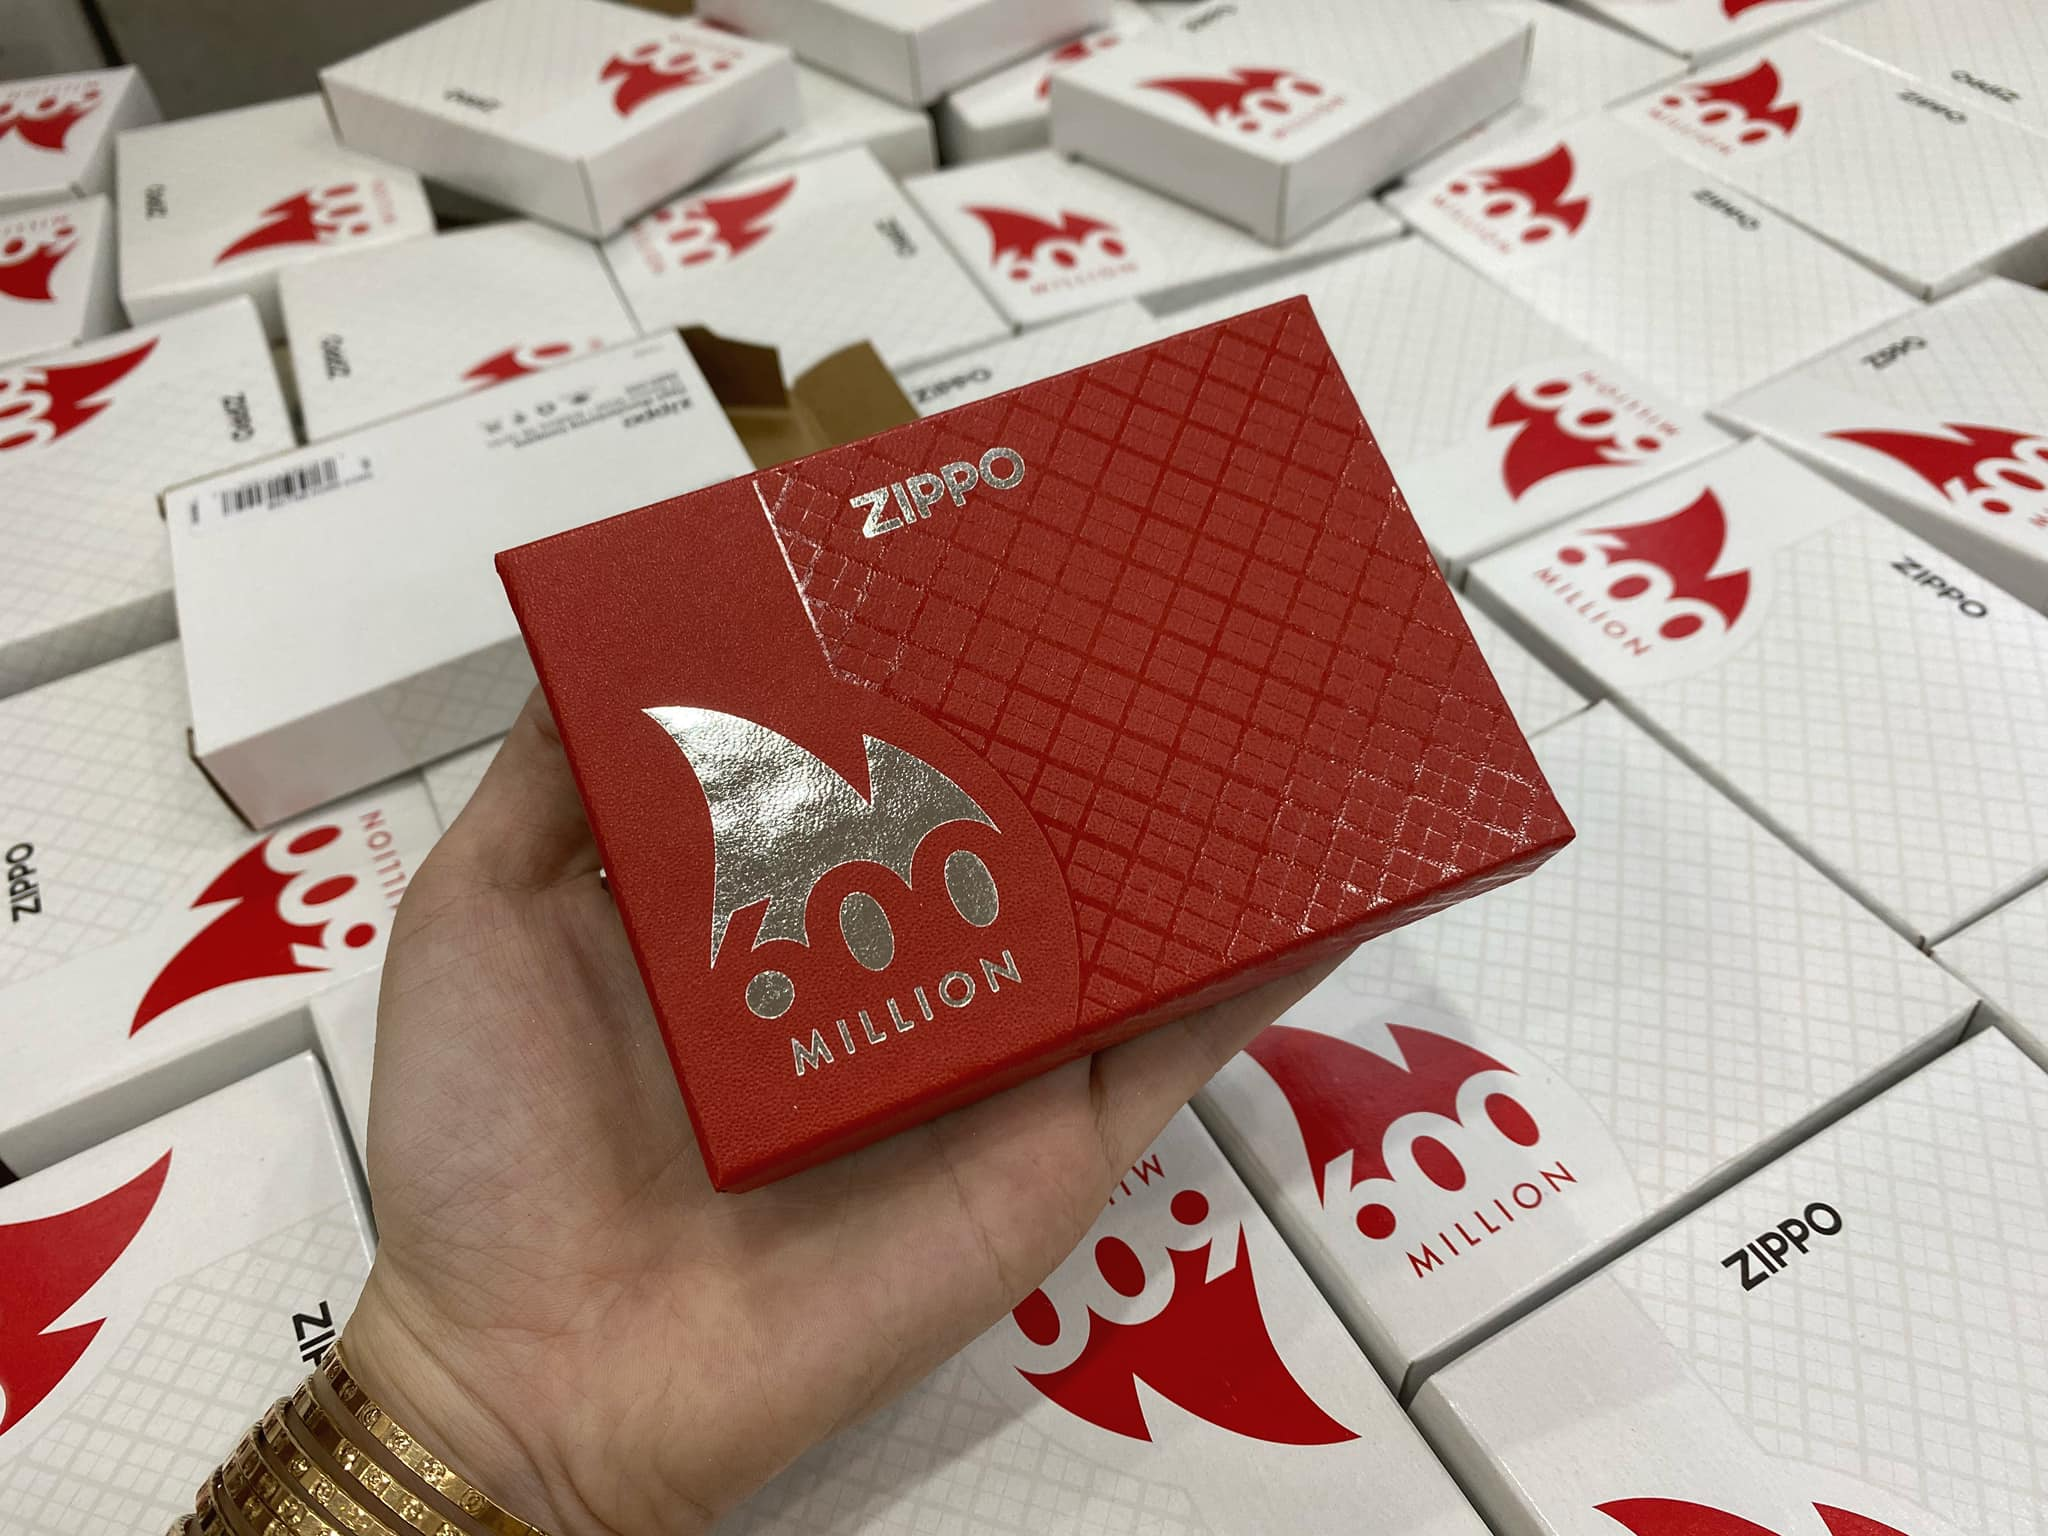 Zippo 600 Millionth Collectible - Zippo 49272 20